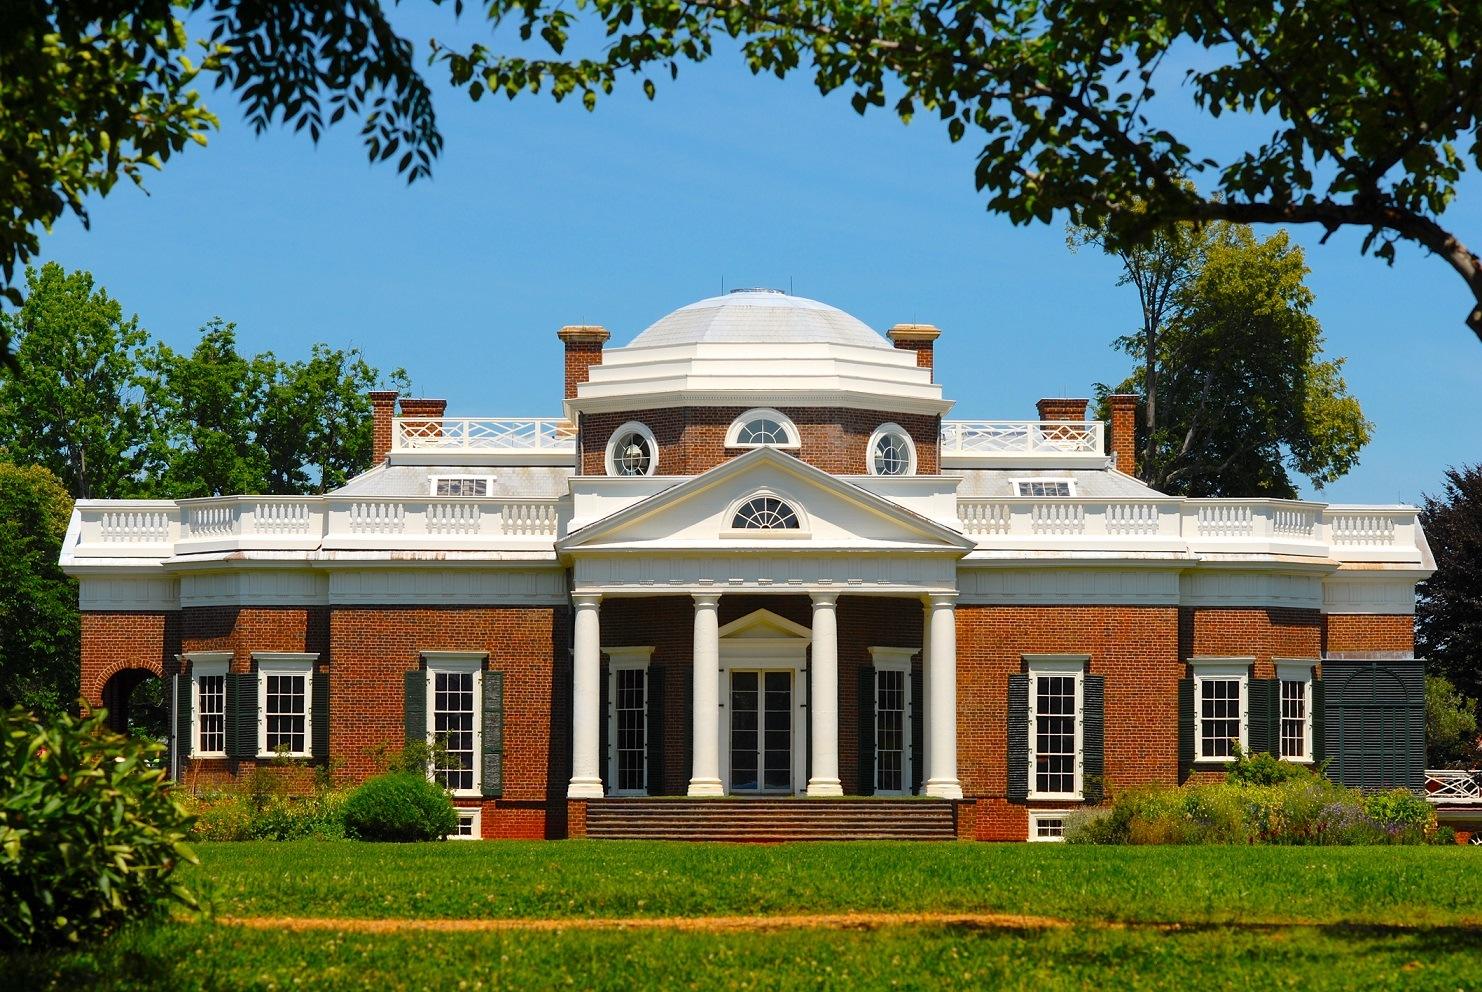 Thomas Jefferson's home, Monticello